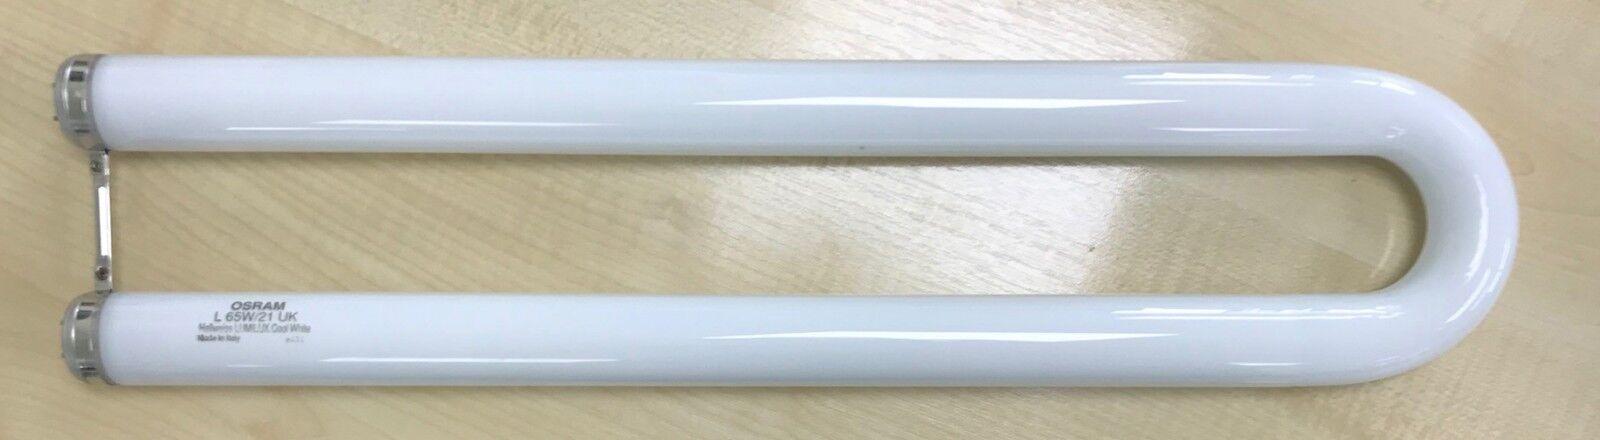 Osram 65w Cool White T12 Florescent U-tube L65W 21 U-Form